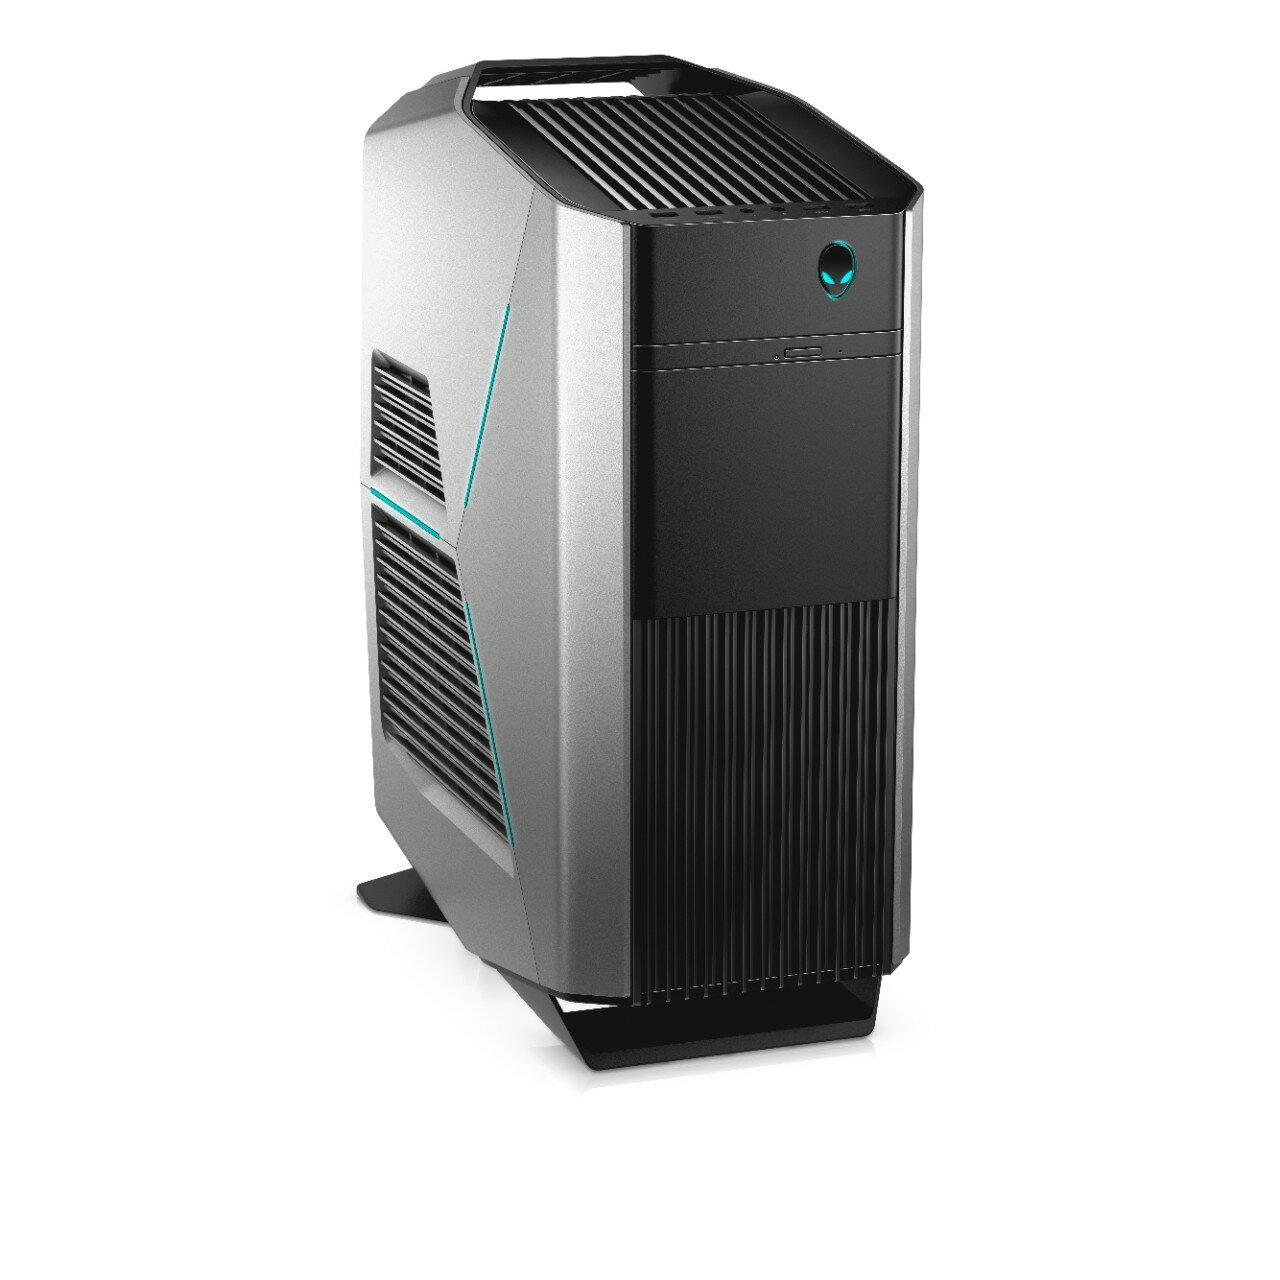 Alienware Aurora R7 Gaming Desktop Intel i5 8400 NVIDIA GTX 1050 Ti 1TB HDD  8GB RAM